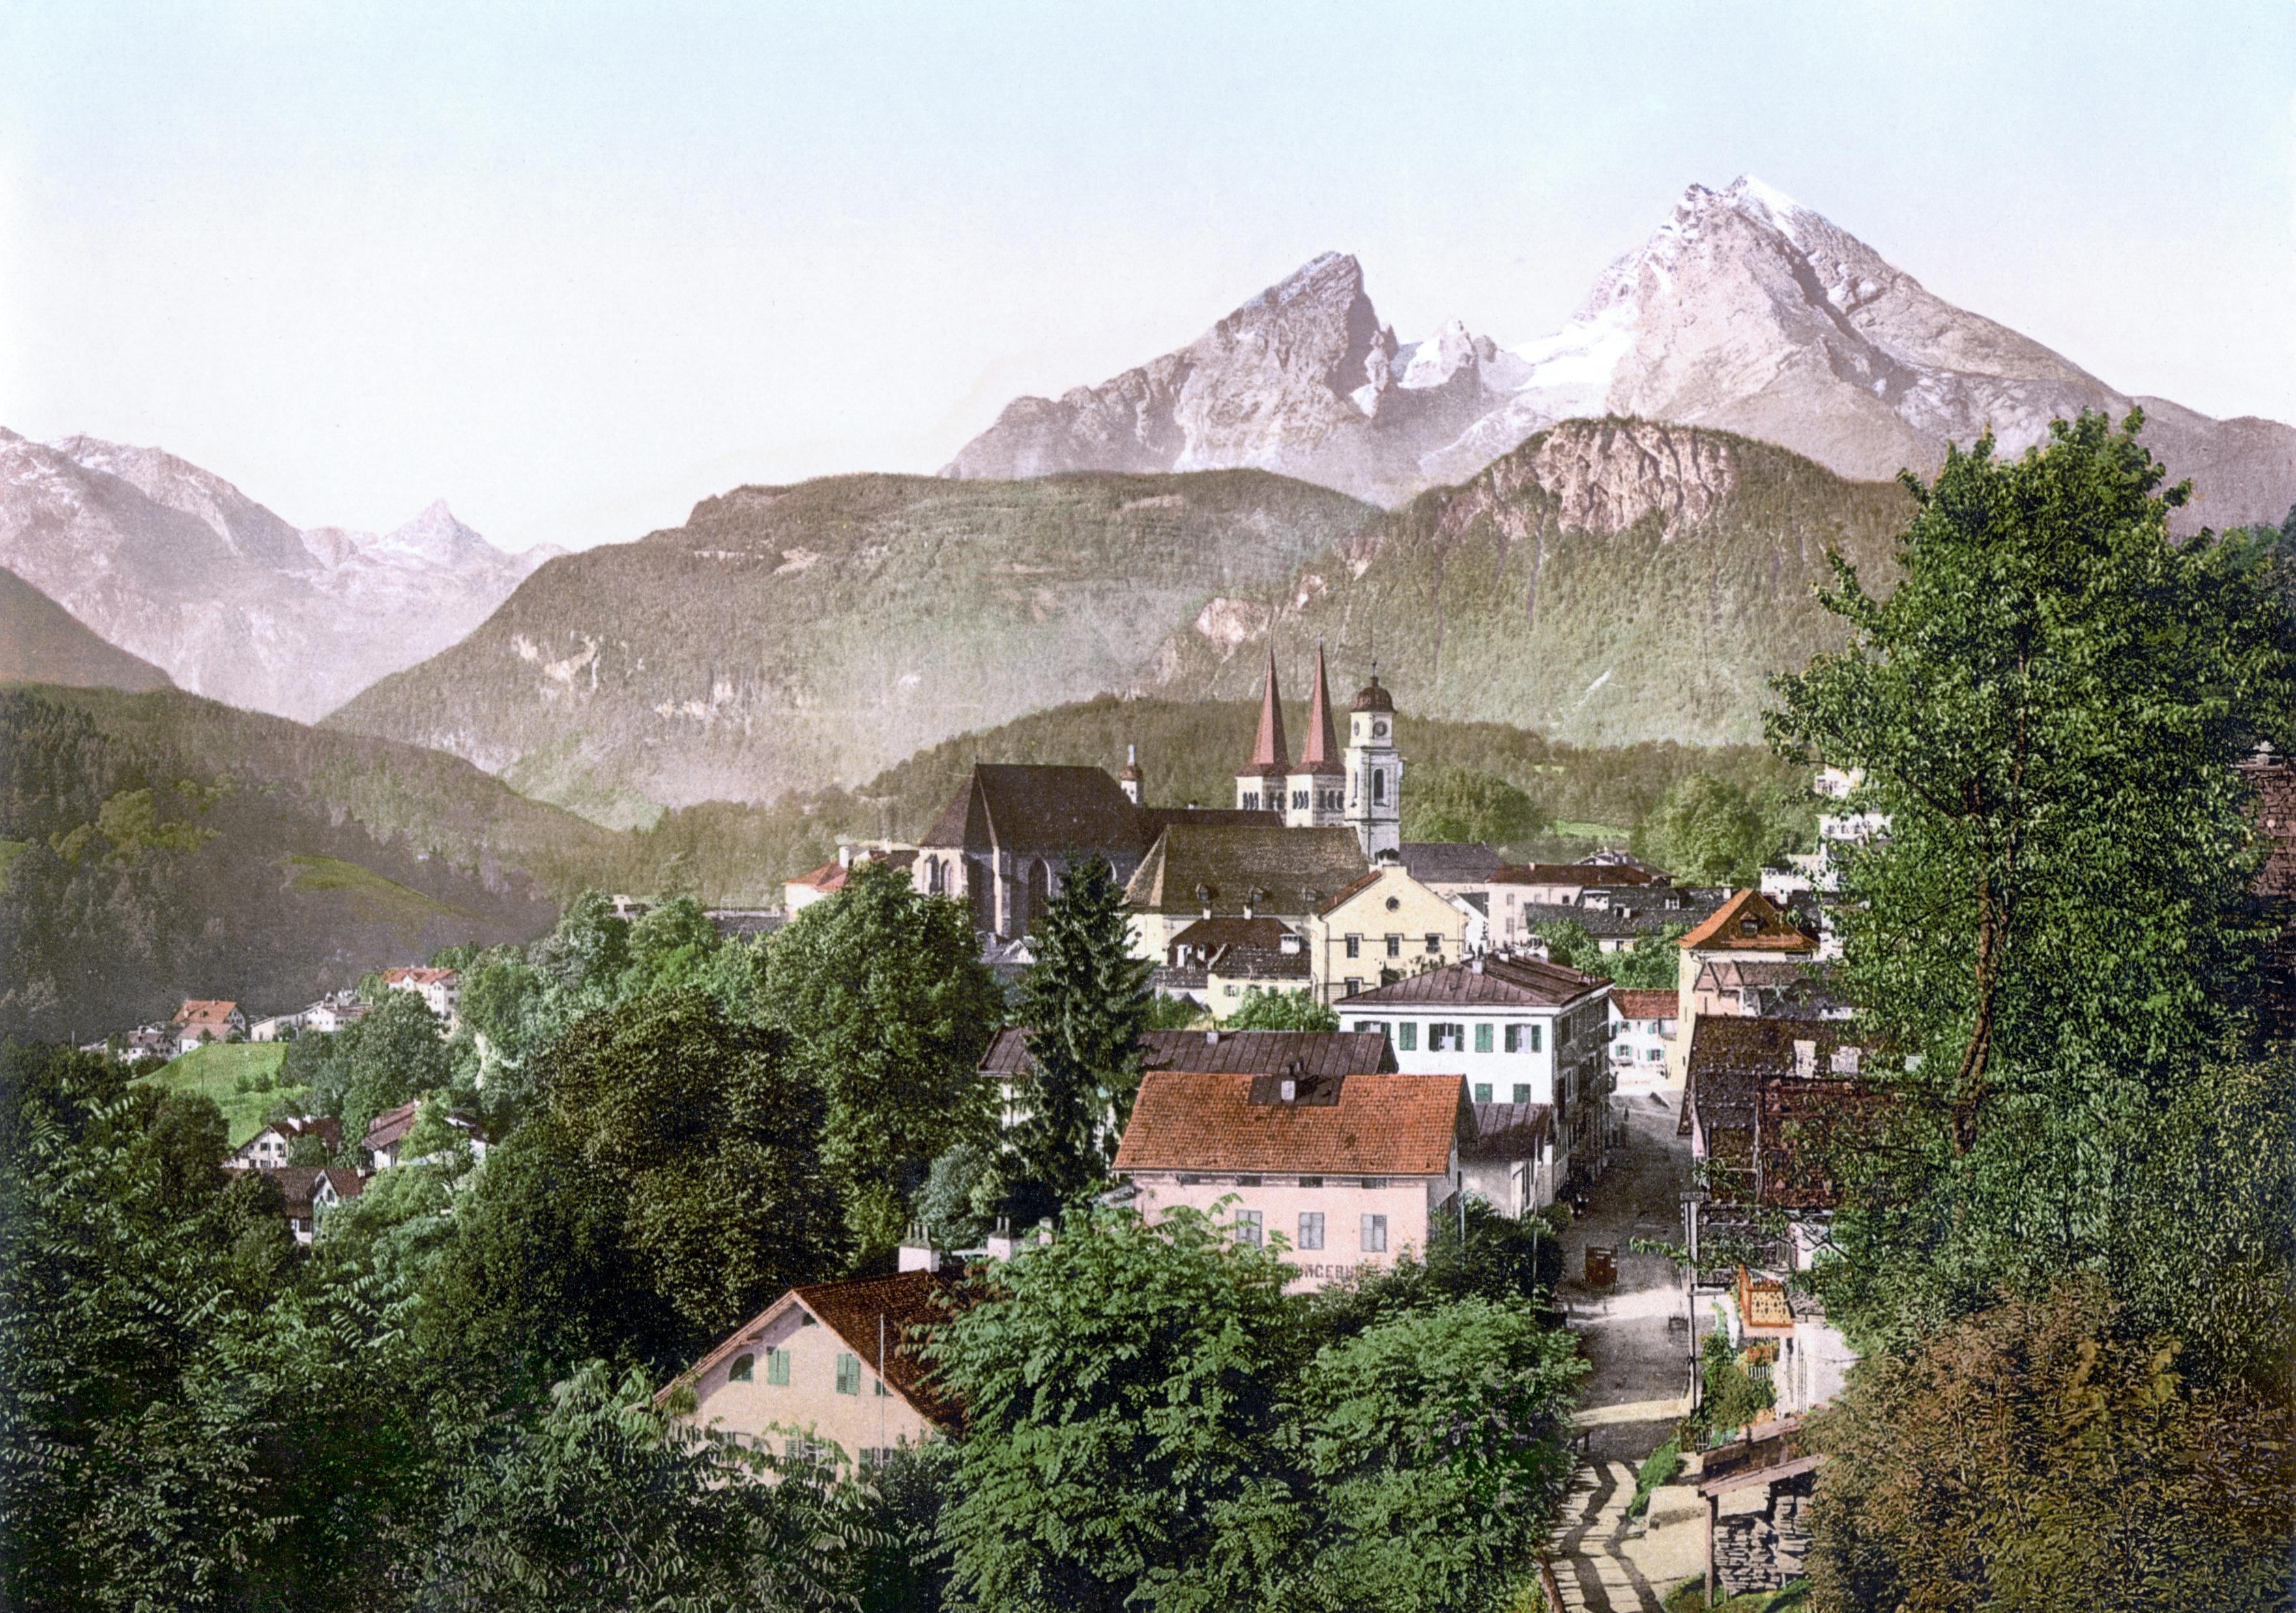 File:Berchtesgaden Watzmann 1900.jpg - Wikimedia Commons